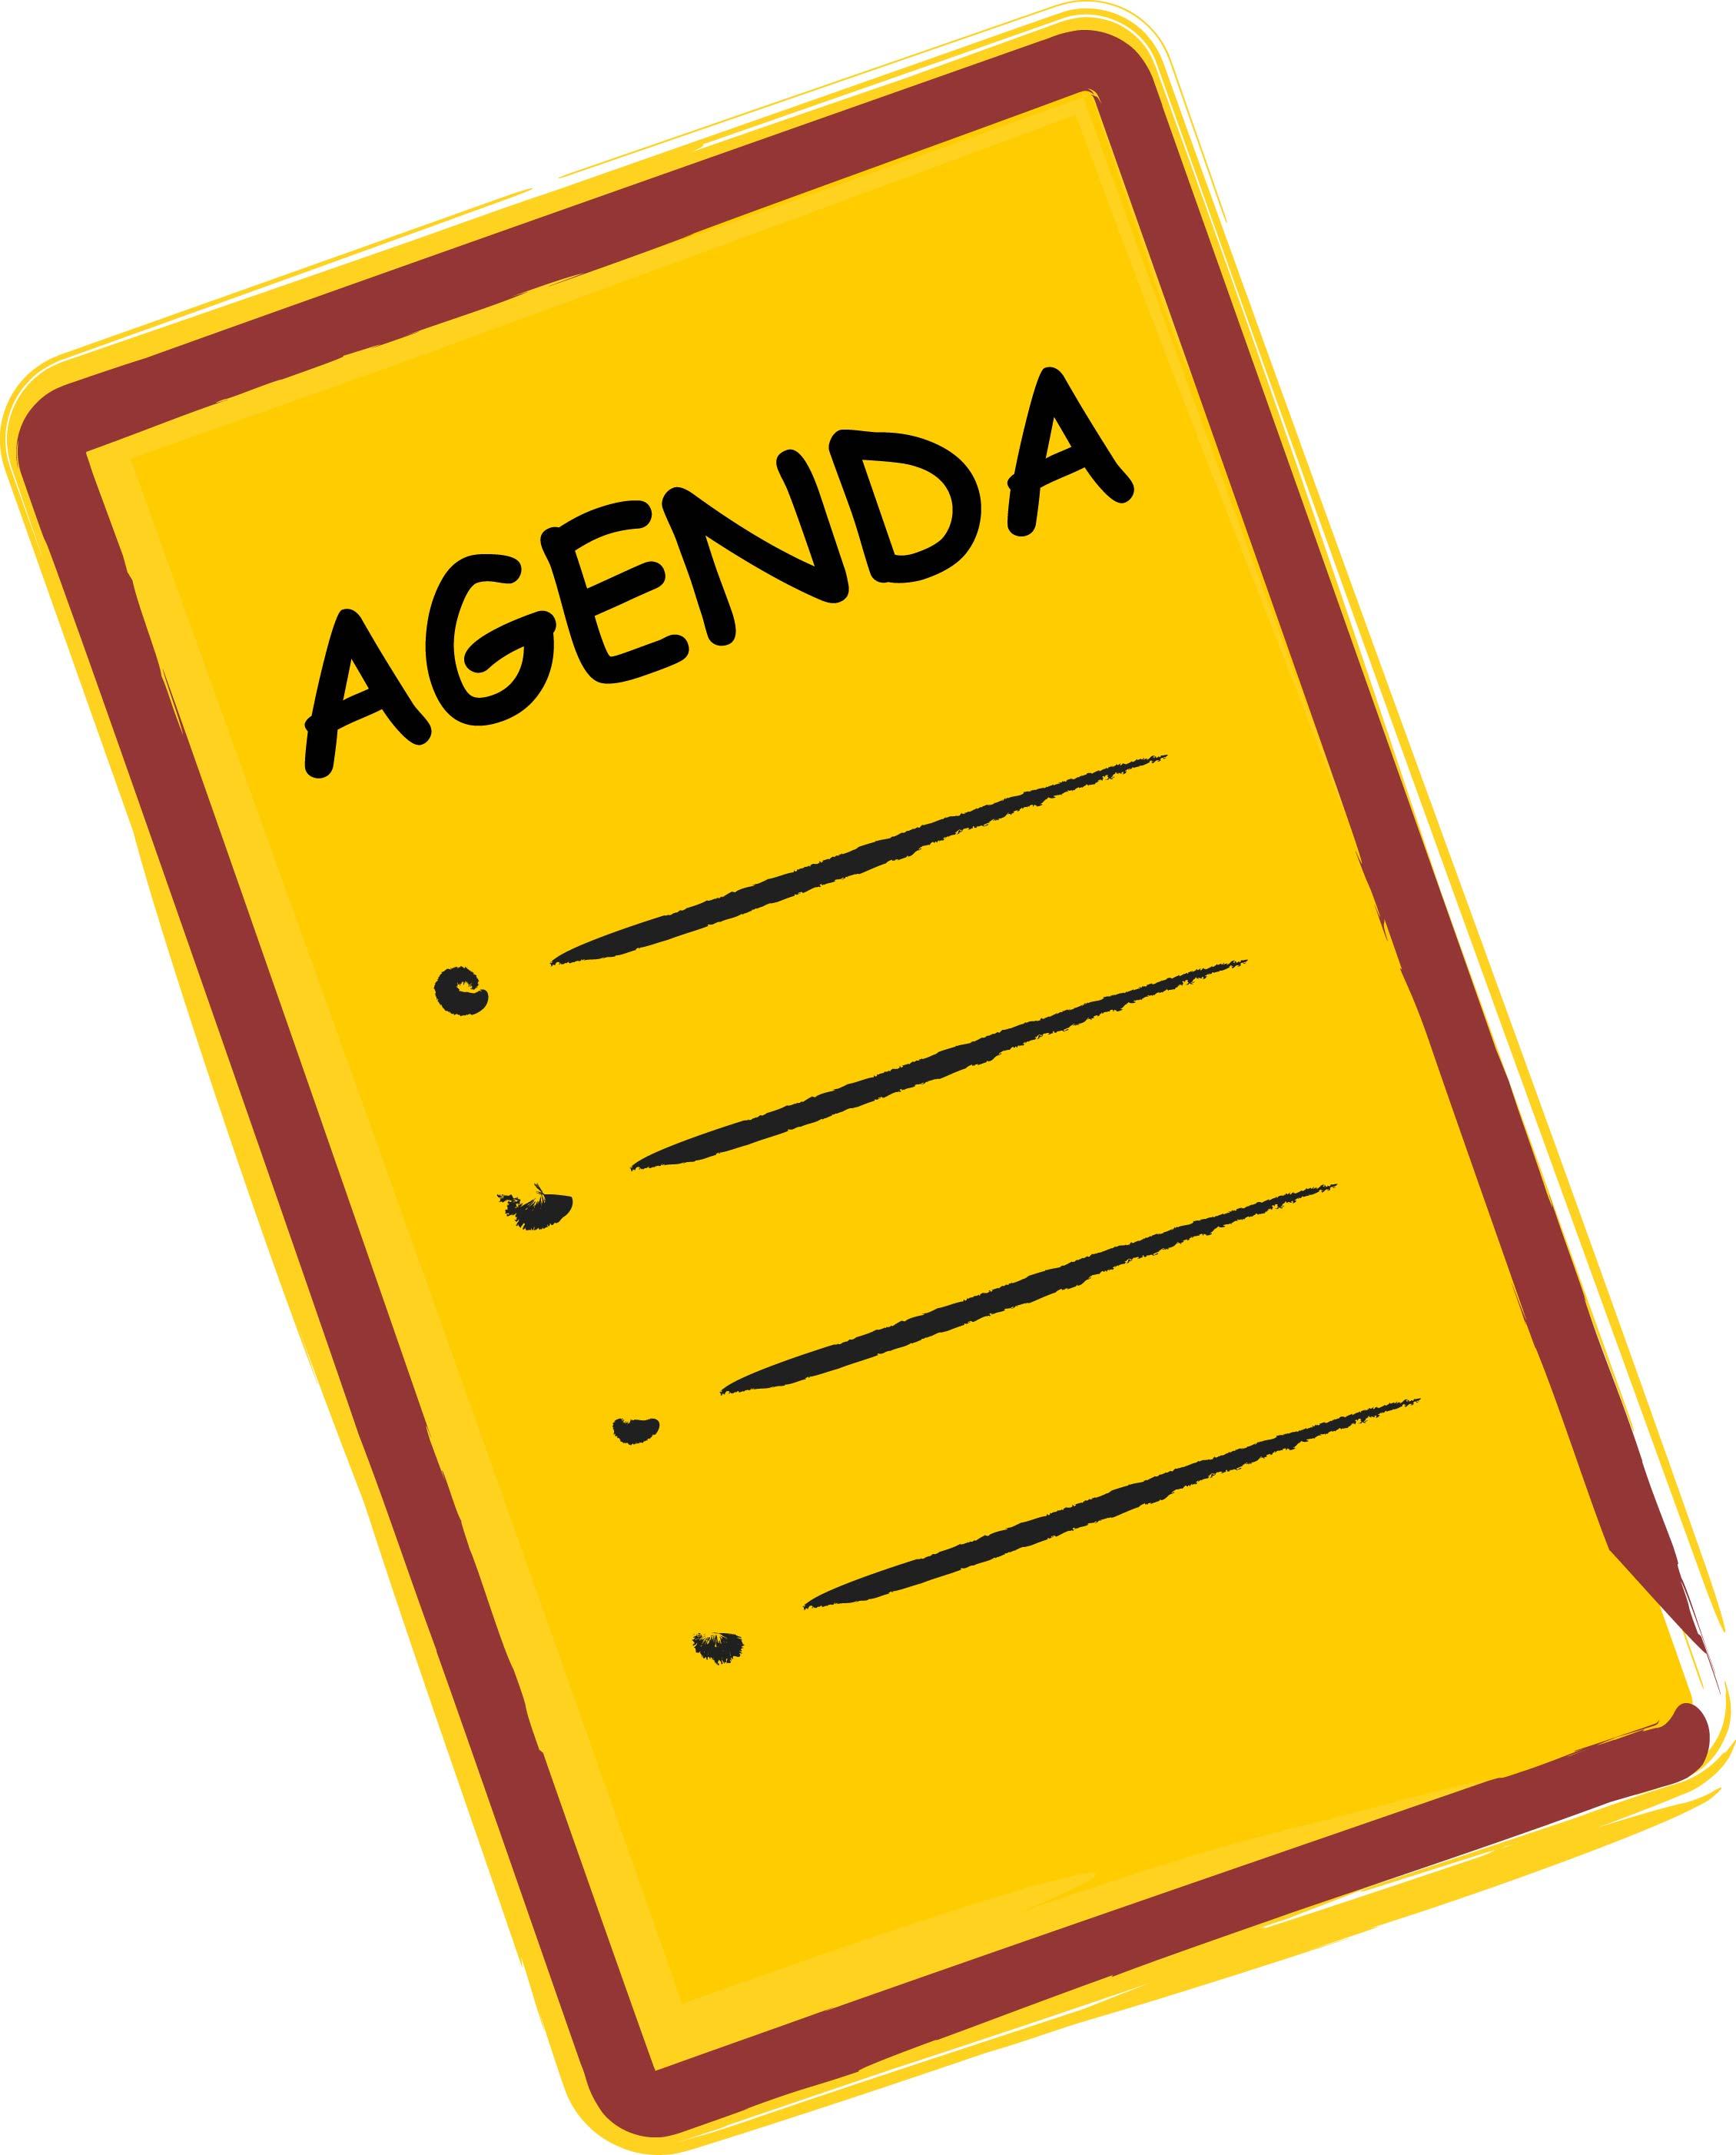 agenda-imagem-animada-0011